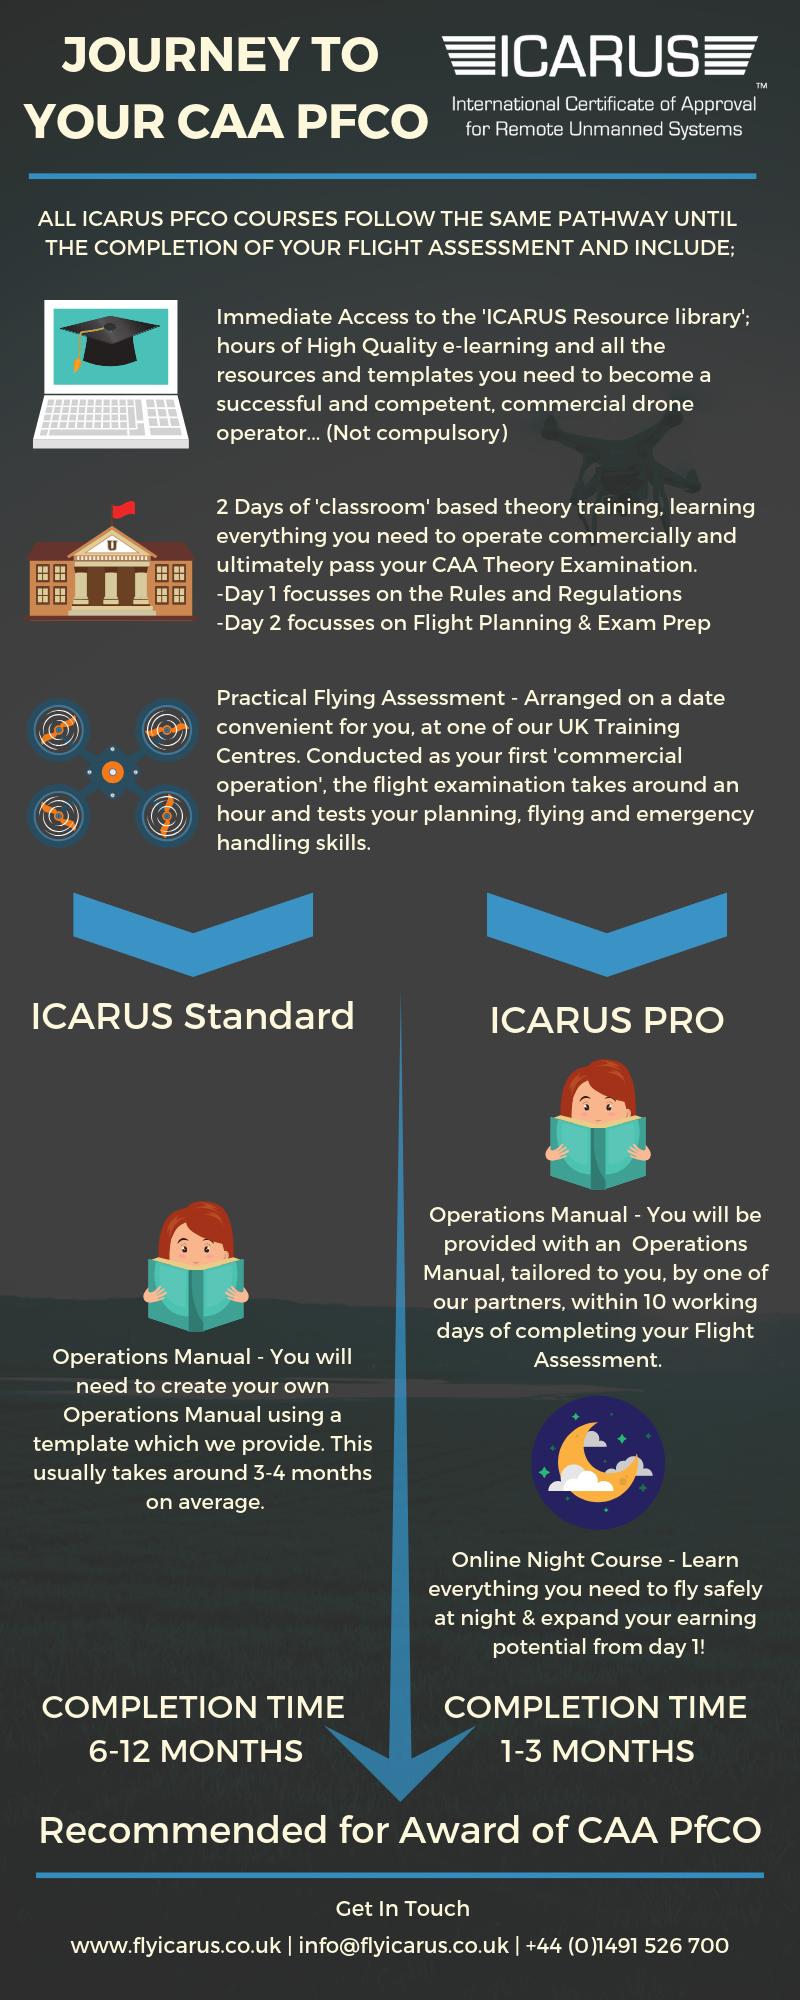 ICARUS Training Workflow Infographic